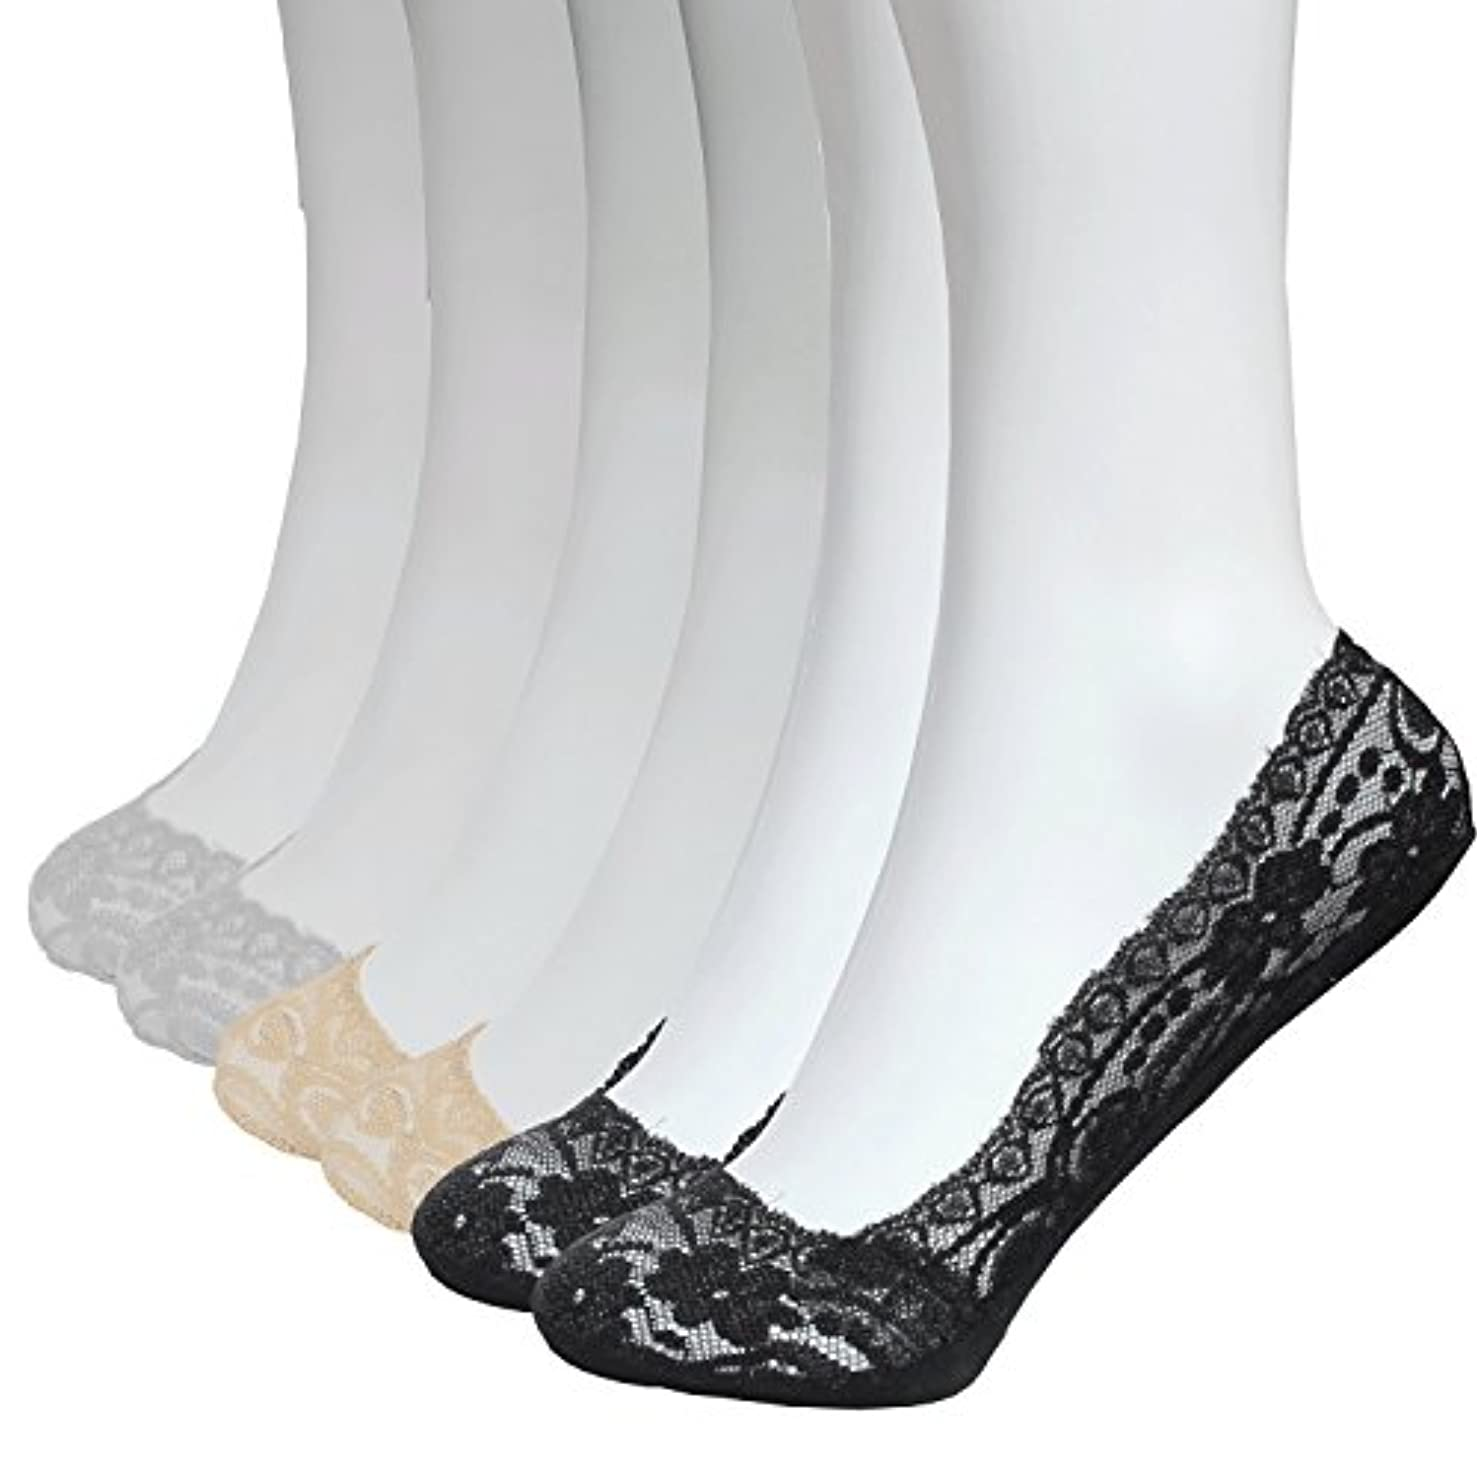 6 Pairs No Show Socks Women Lace Thin Casual Socks Non Slip No Show Socks for Flats Liner Socks